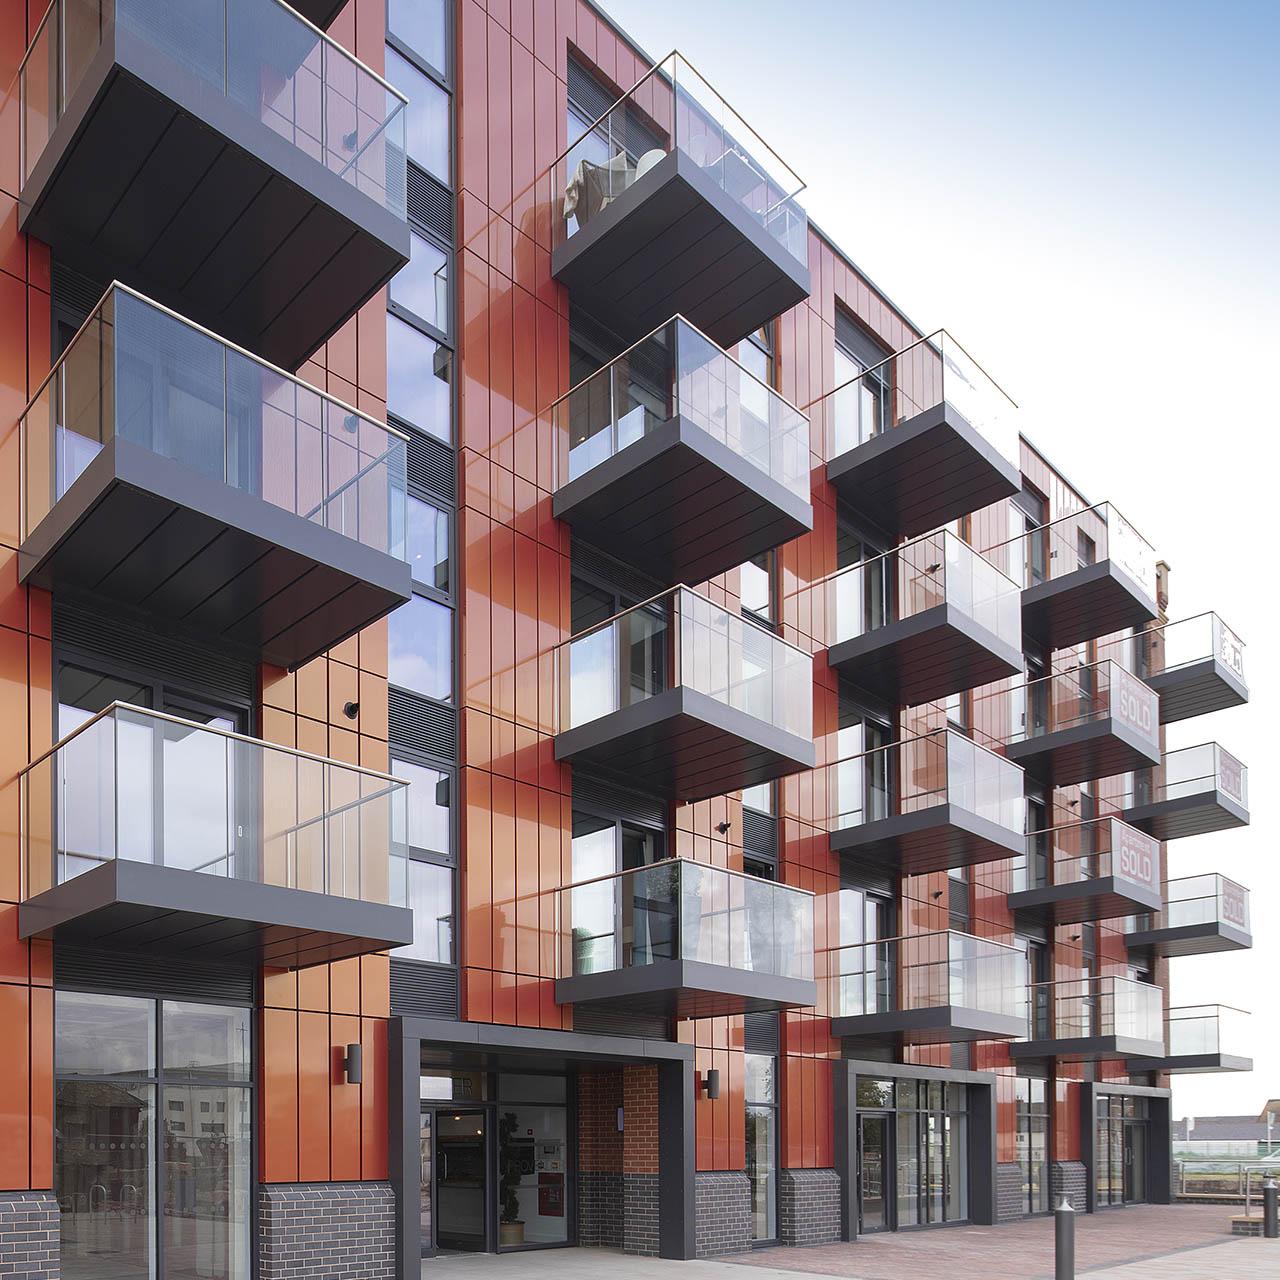 modular balconies along a building front